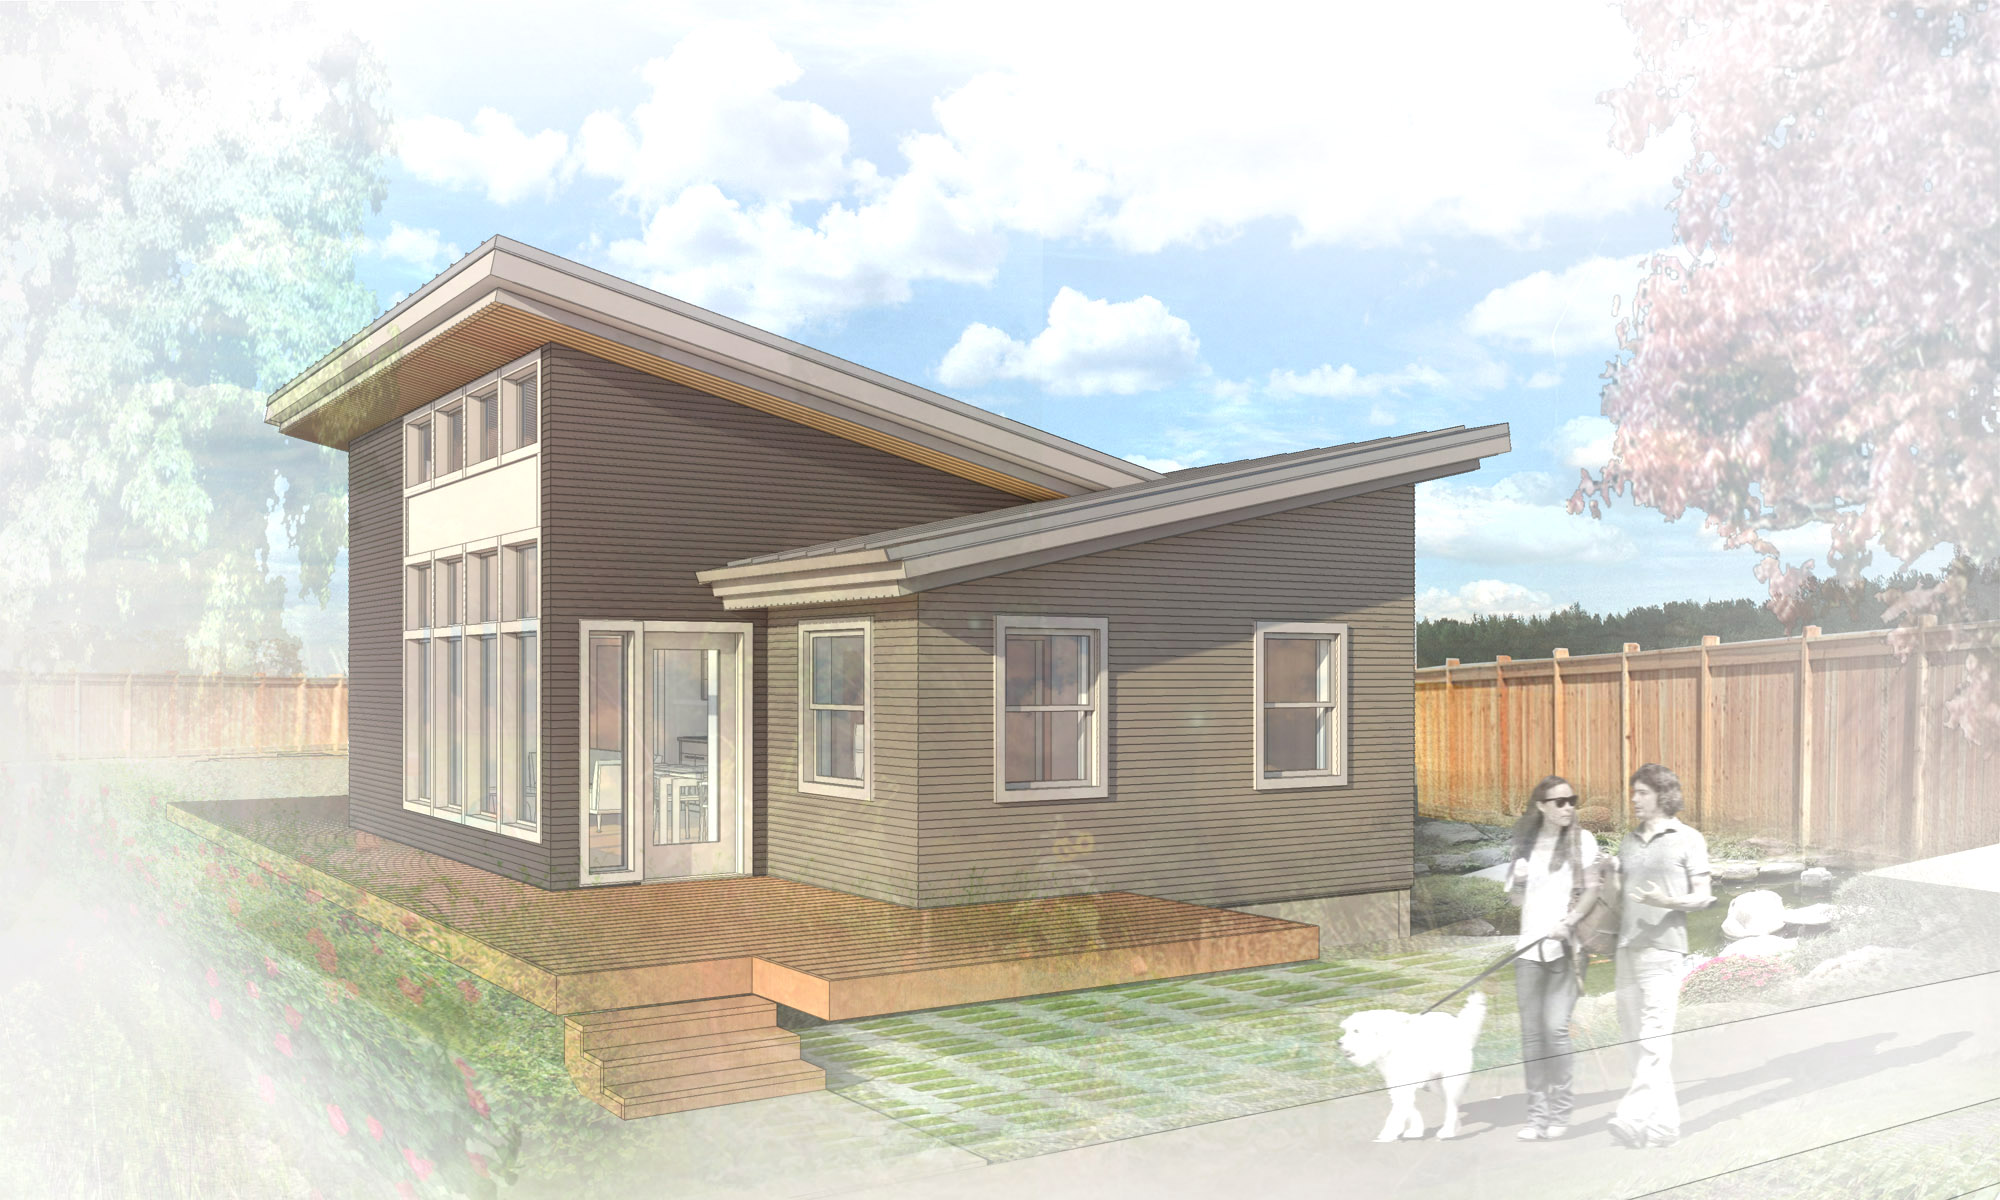 Oregon DEQ Accessory Dwelling Units Explainer Video